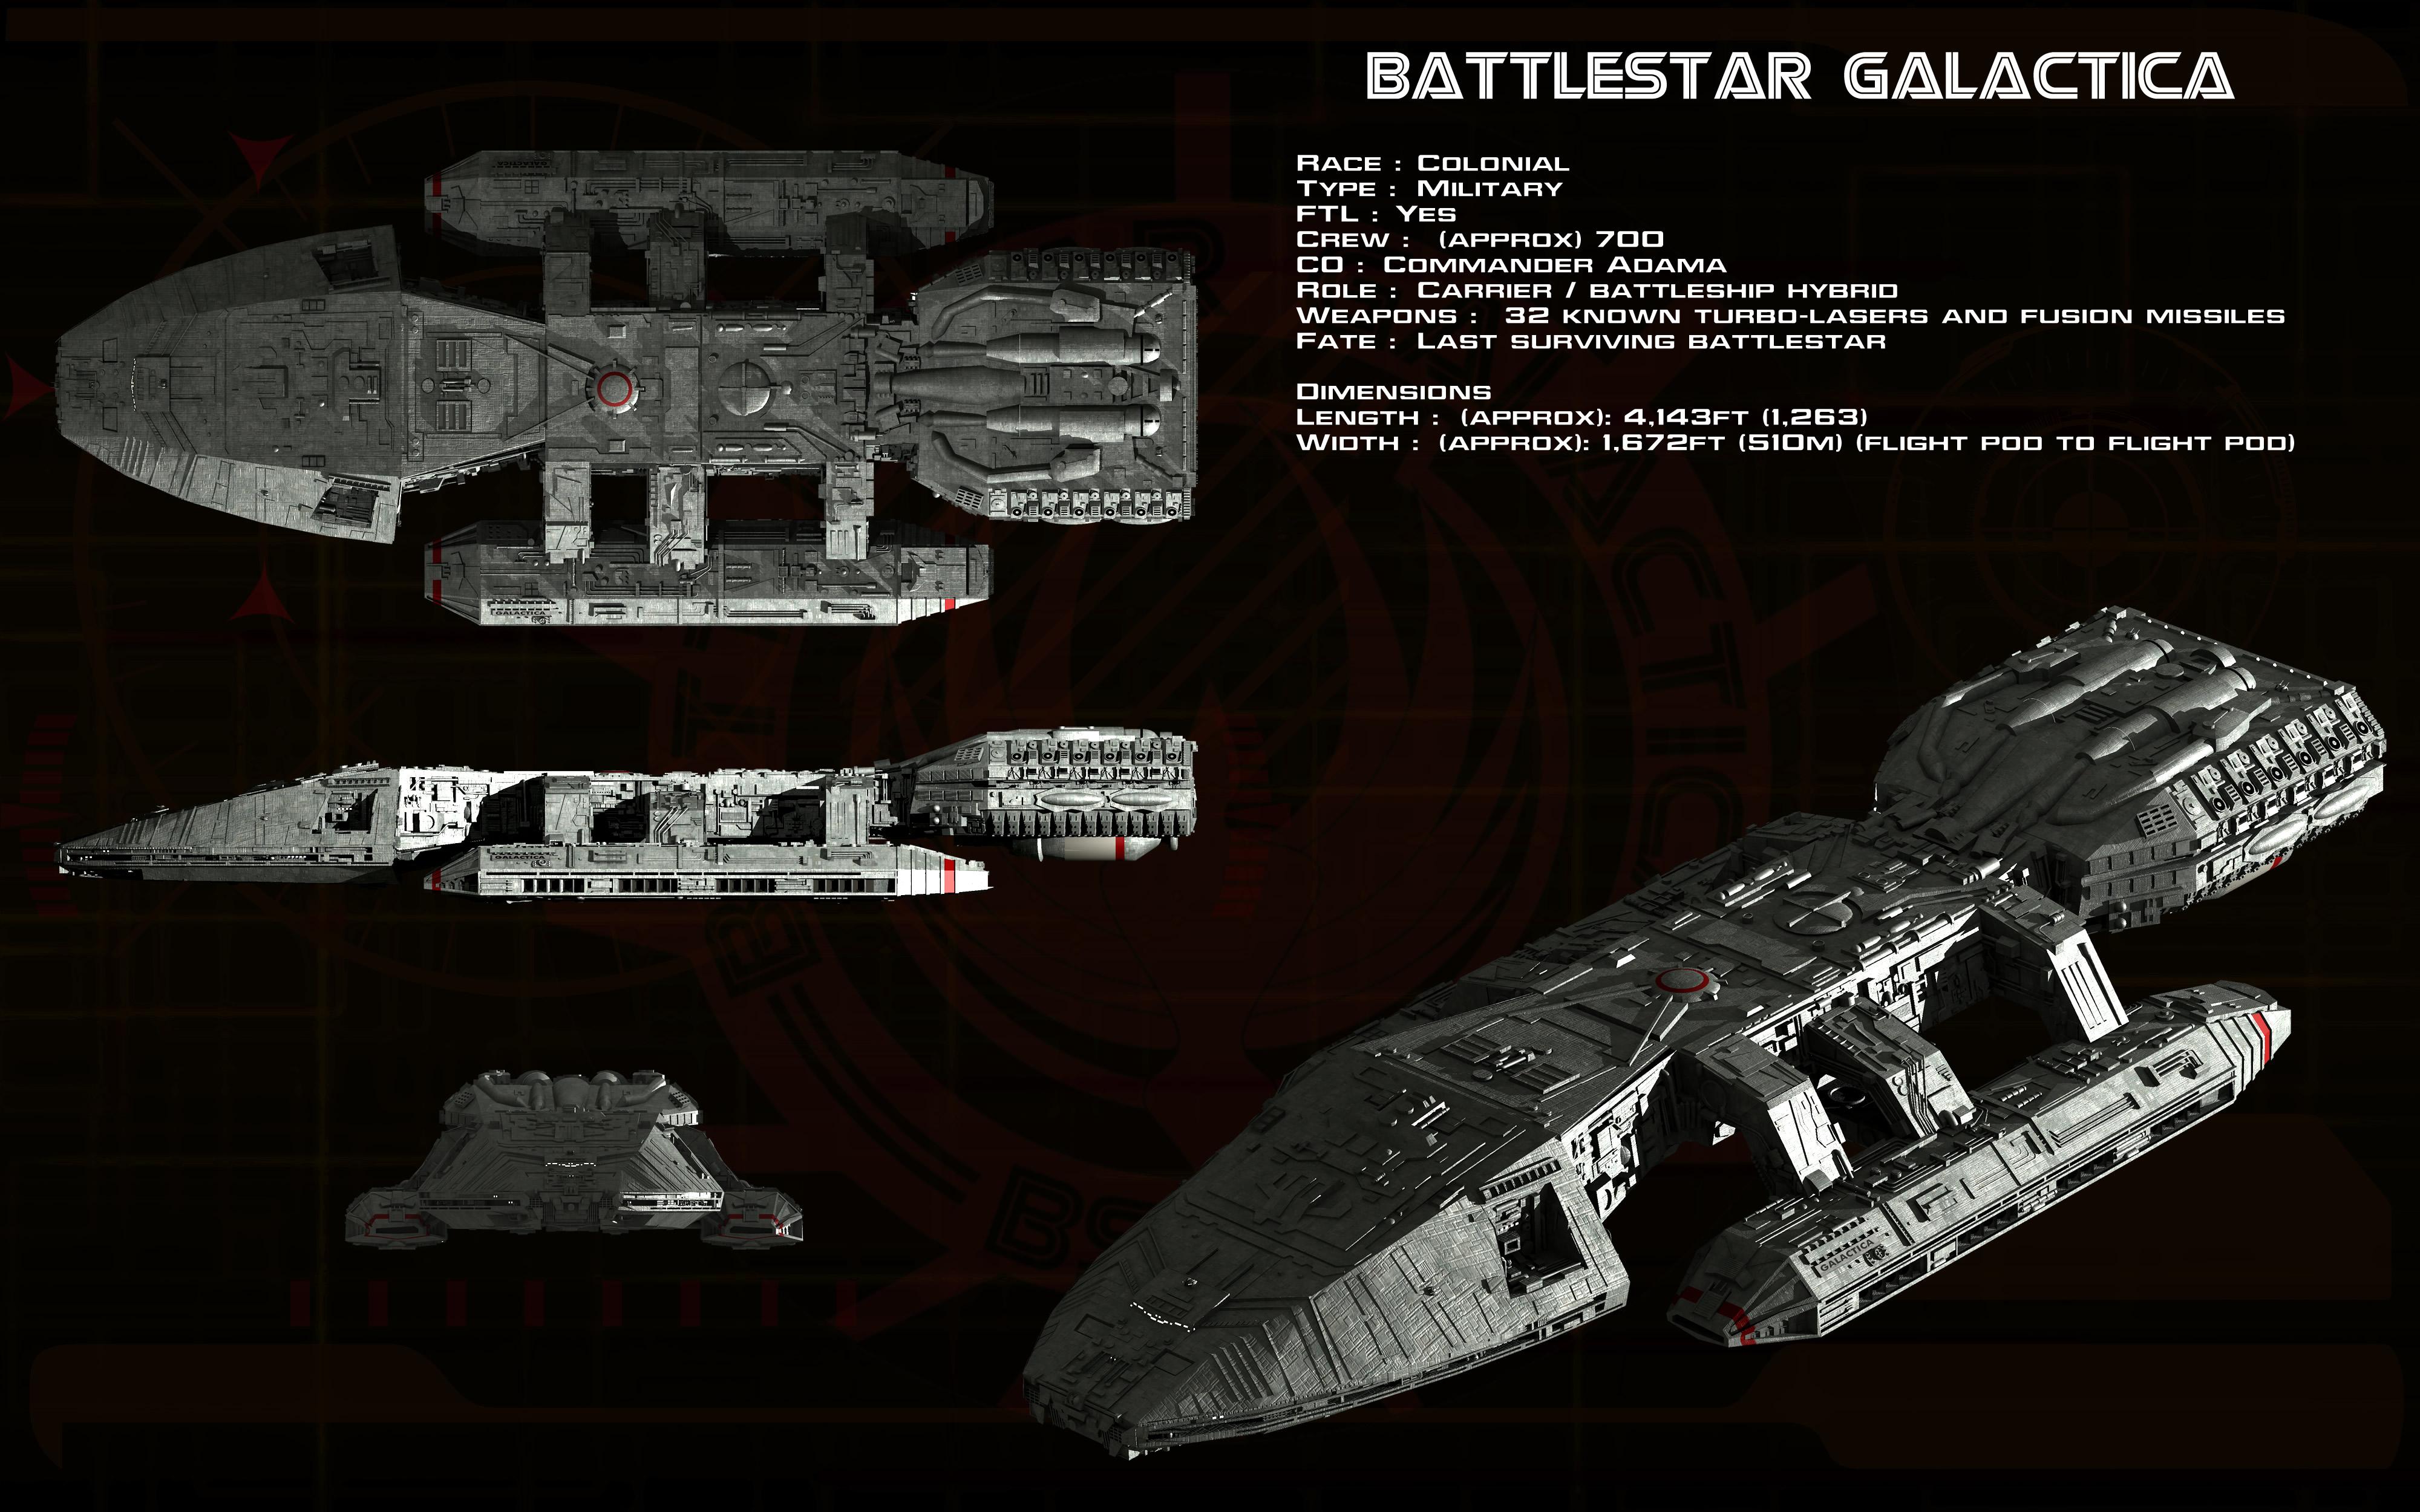 Battlestar Galactica (TOS) ortho [updated]